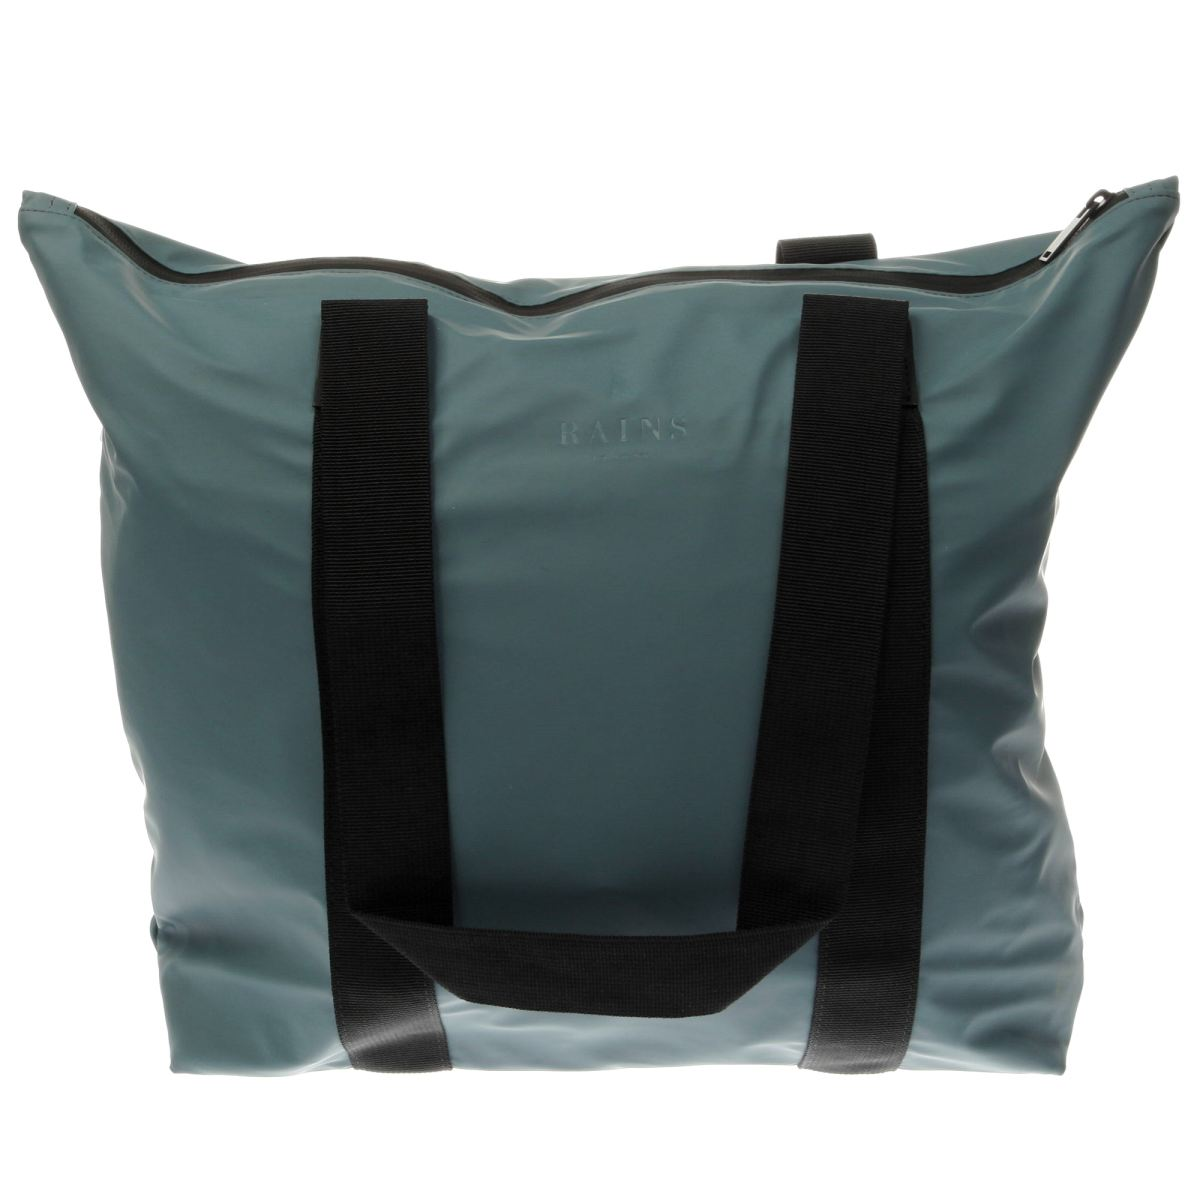 Rains Rains Teal Tote Bag Rush Bags